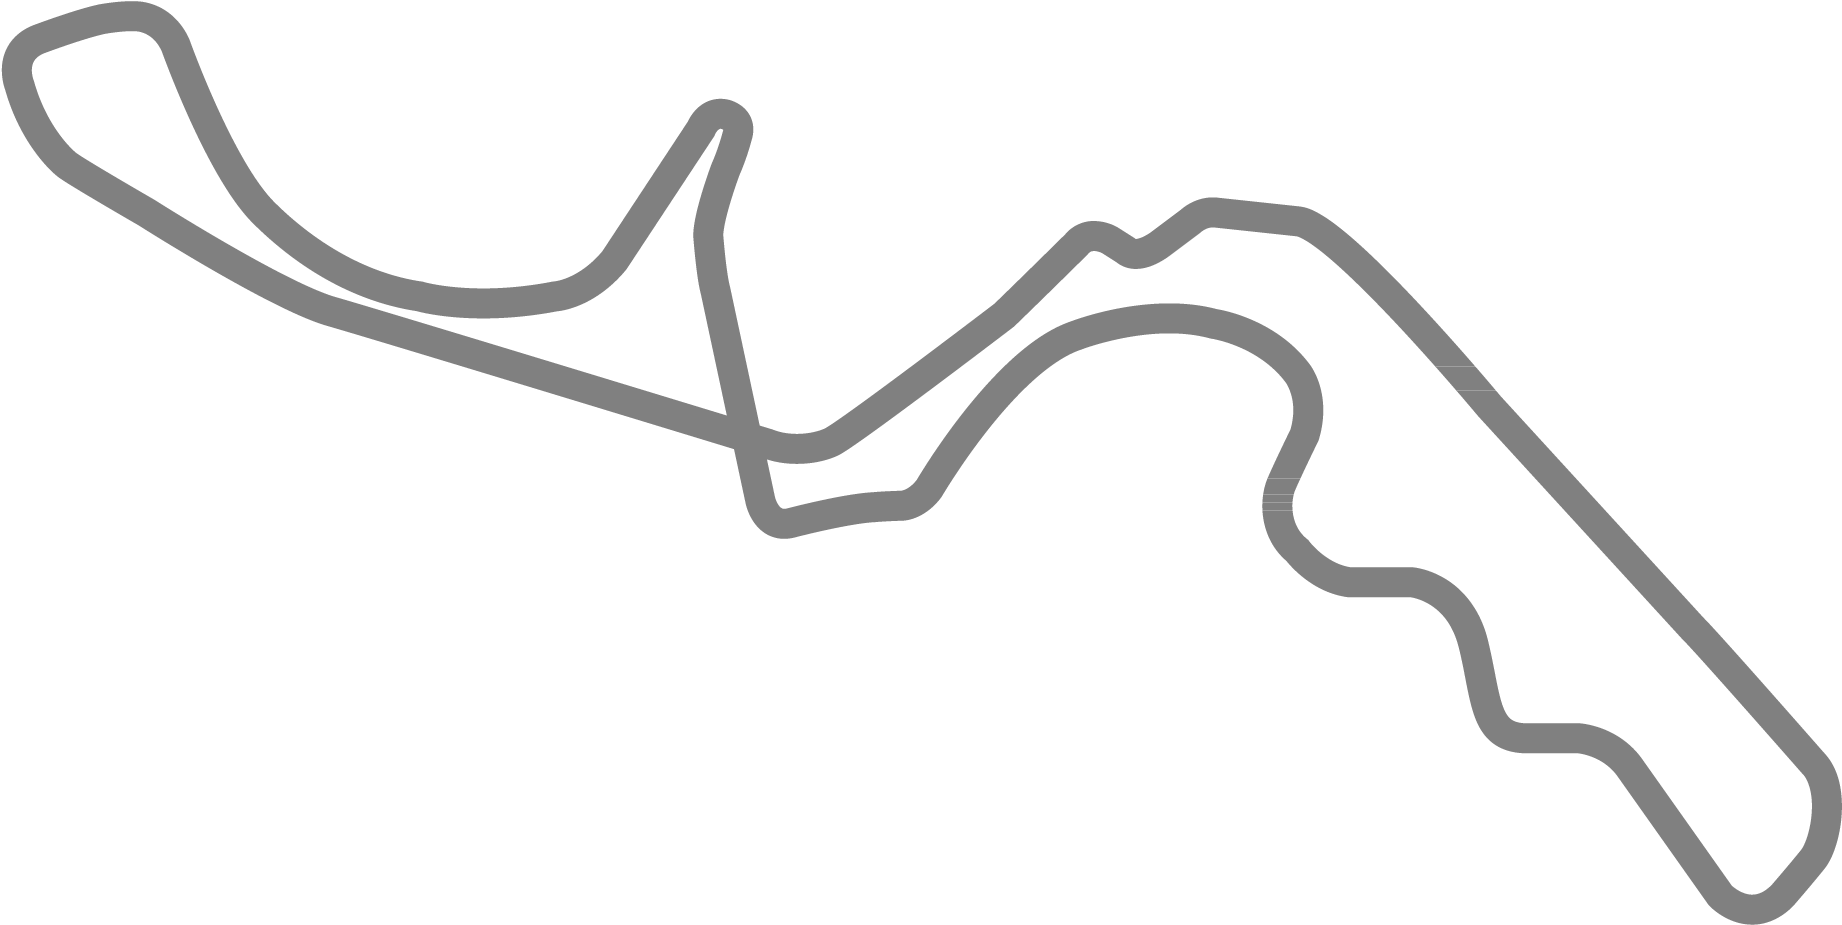 Suzuka Circuit - Suzuka Circuit Logo Png | Full Size PNG